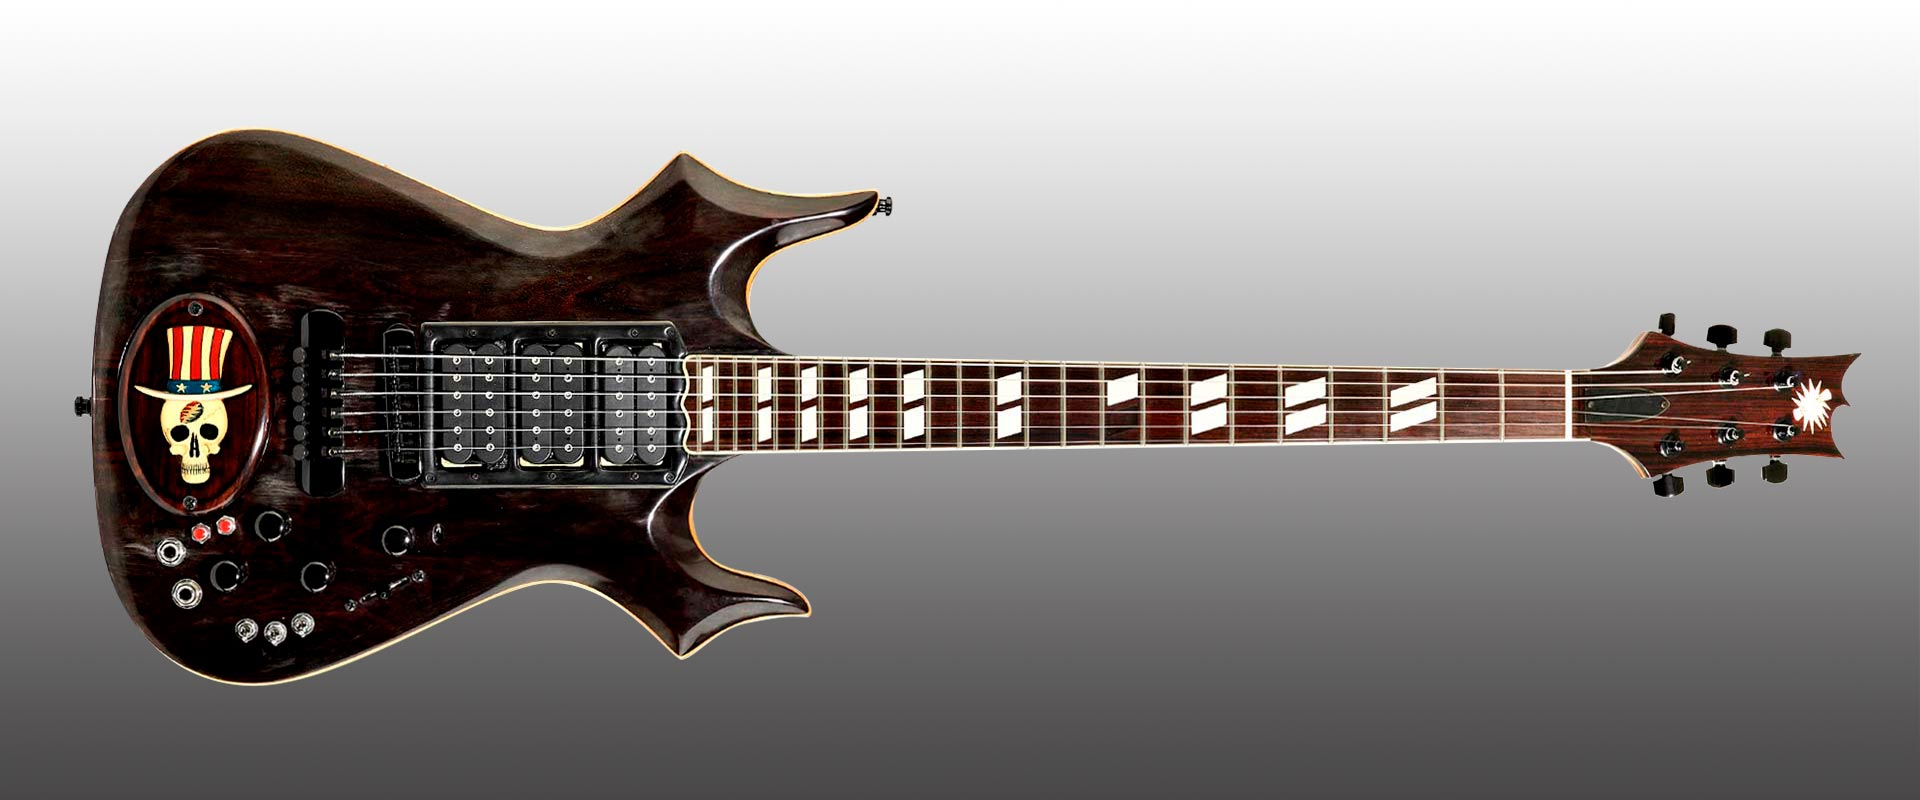 Jerry Garcia Cripe Top Hat Guitar